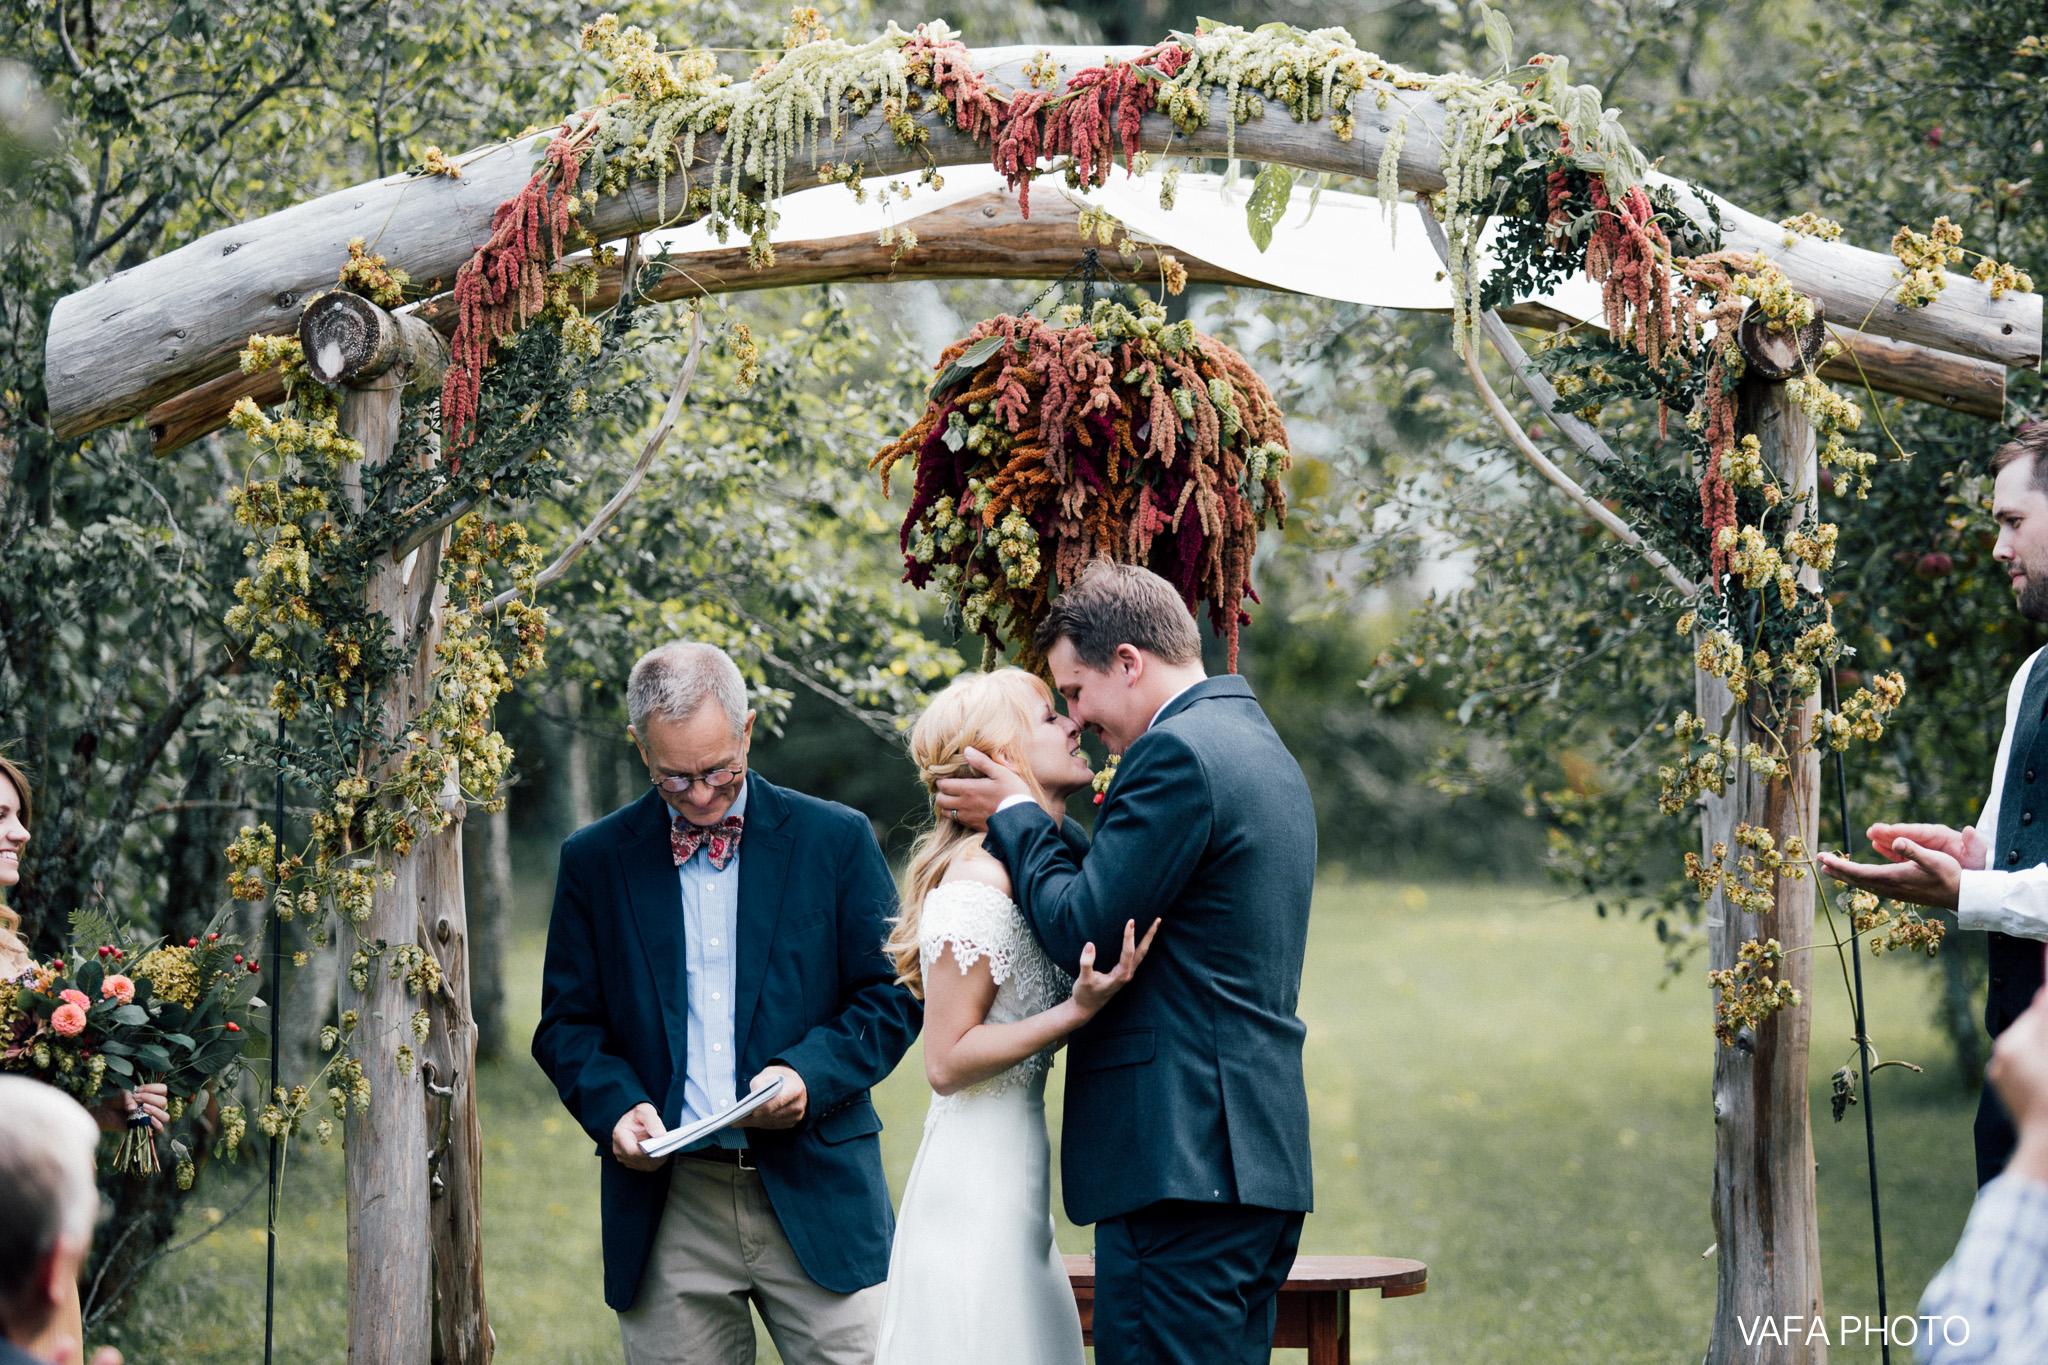 Belsolda-Farm-Wedding-Christy-Eric-Vafa-Photo-500.jpg